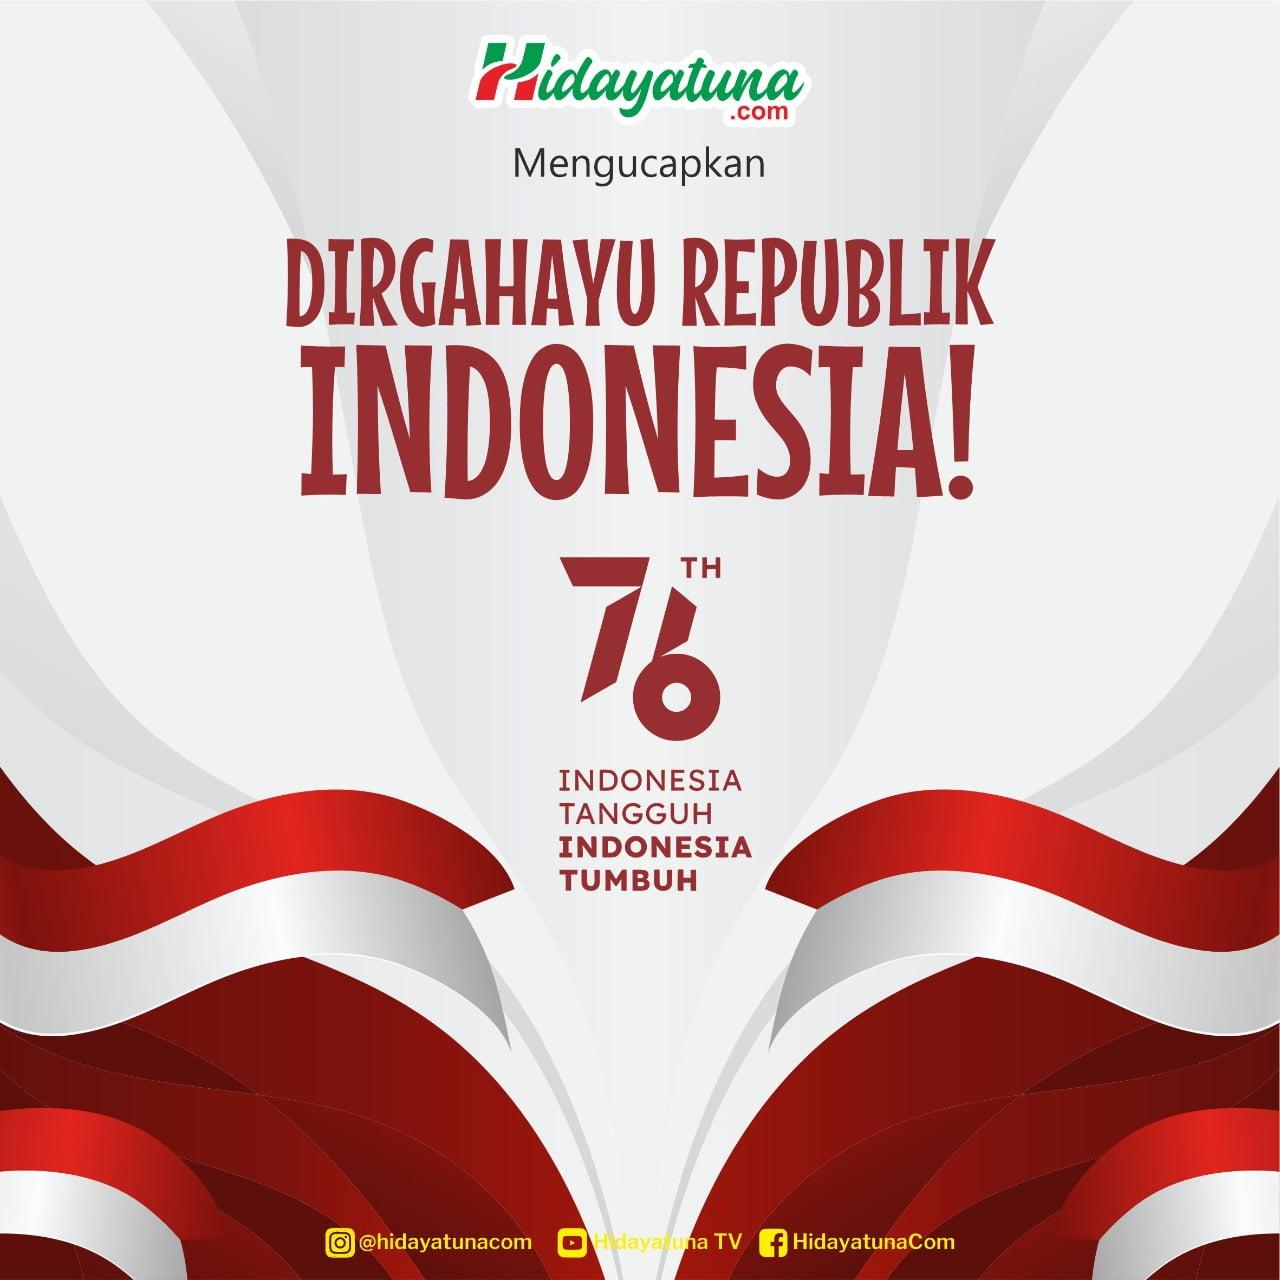 Kemerdekaan Indonesia (Ilustrasi/Hidayatuna)